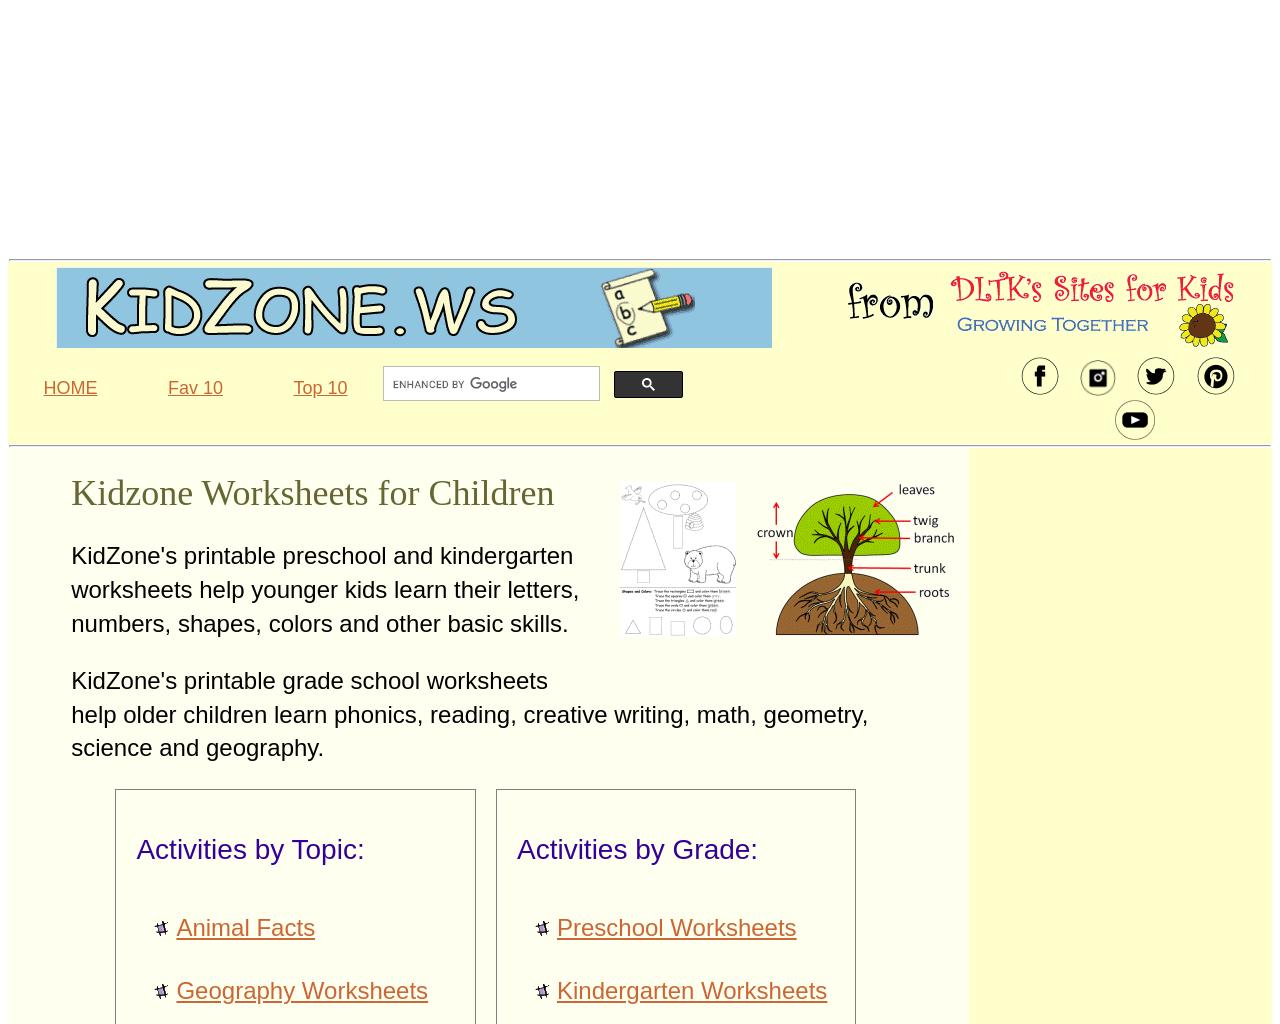 Kidzone Worksheets for Children